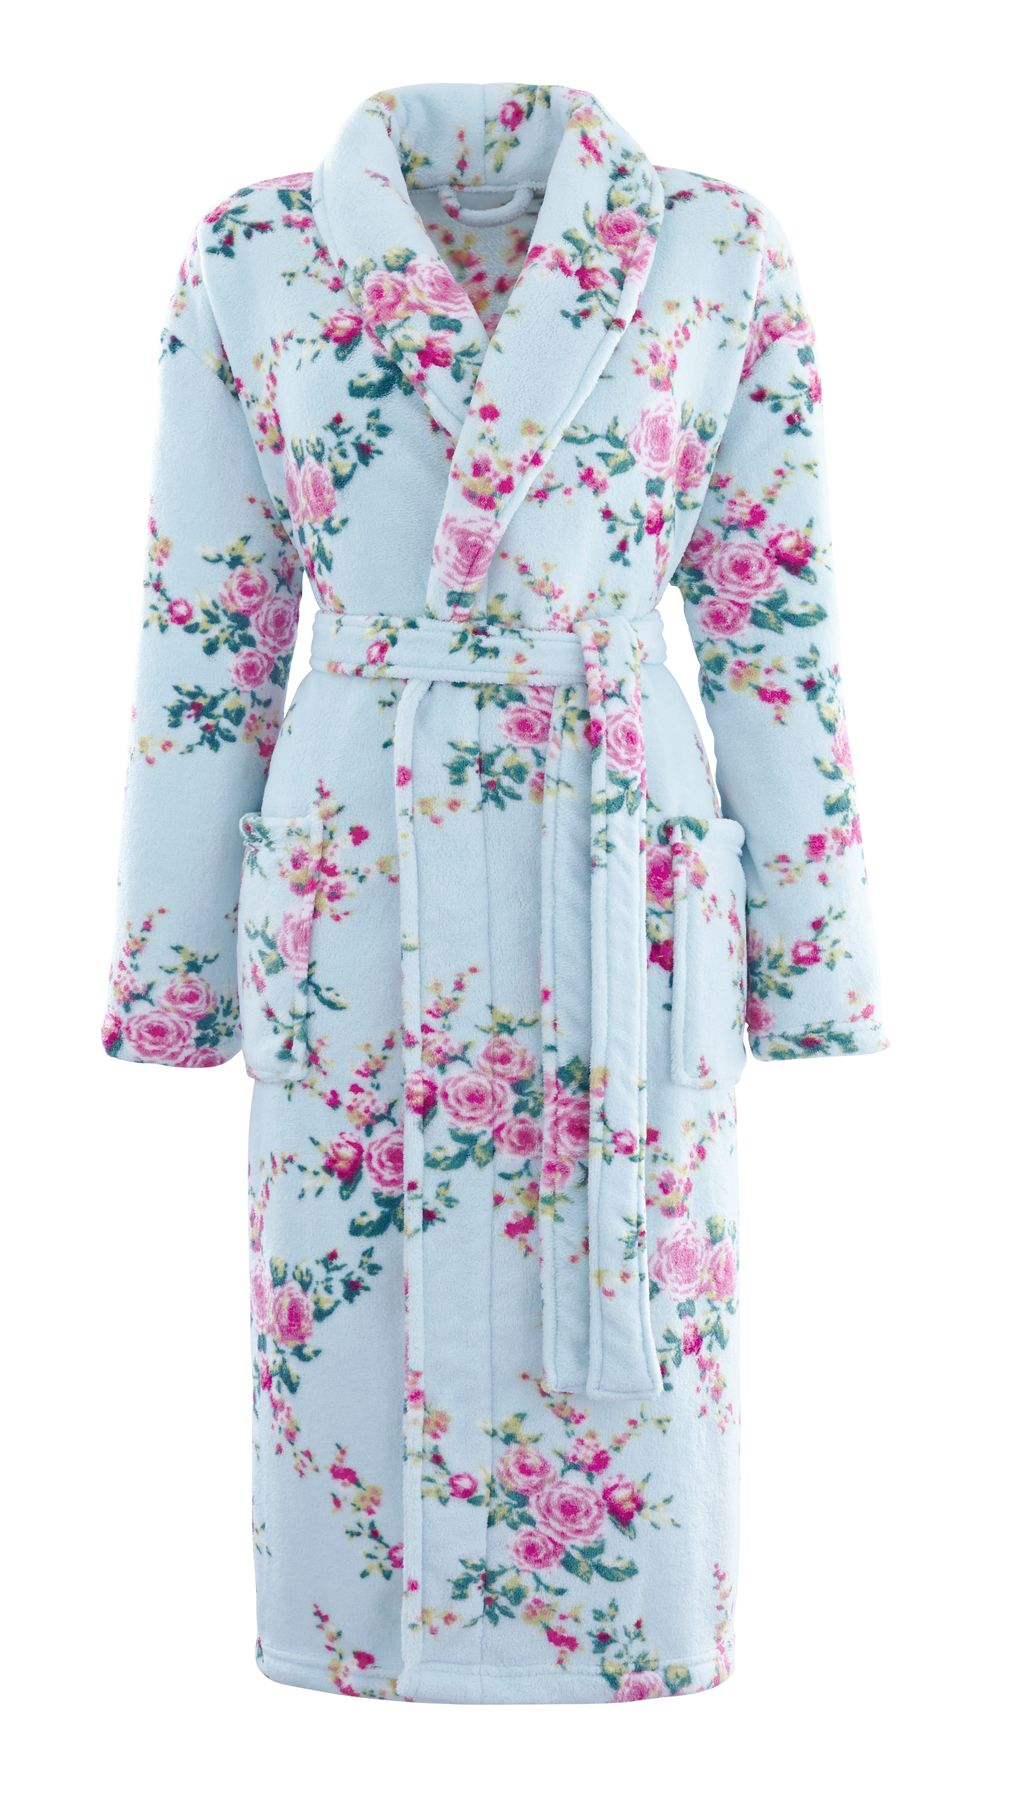 Bathrobe Dressing Gown House Coat Unisex Ladies Mens Gents ...